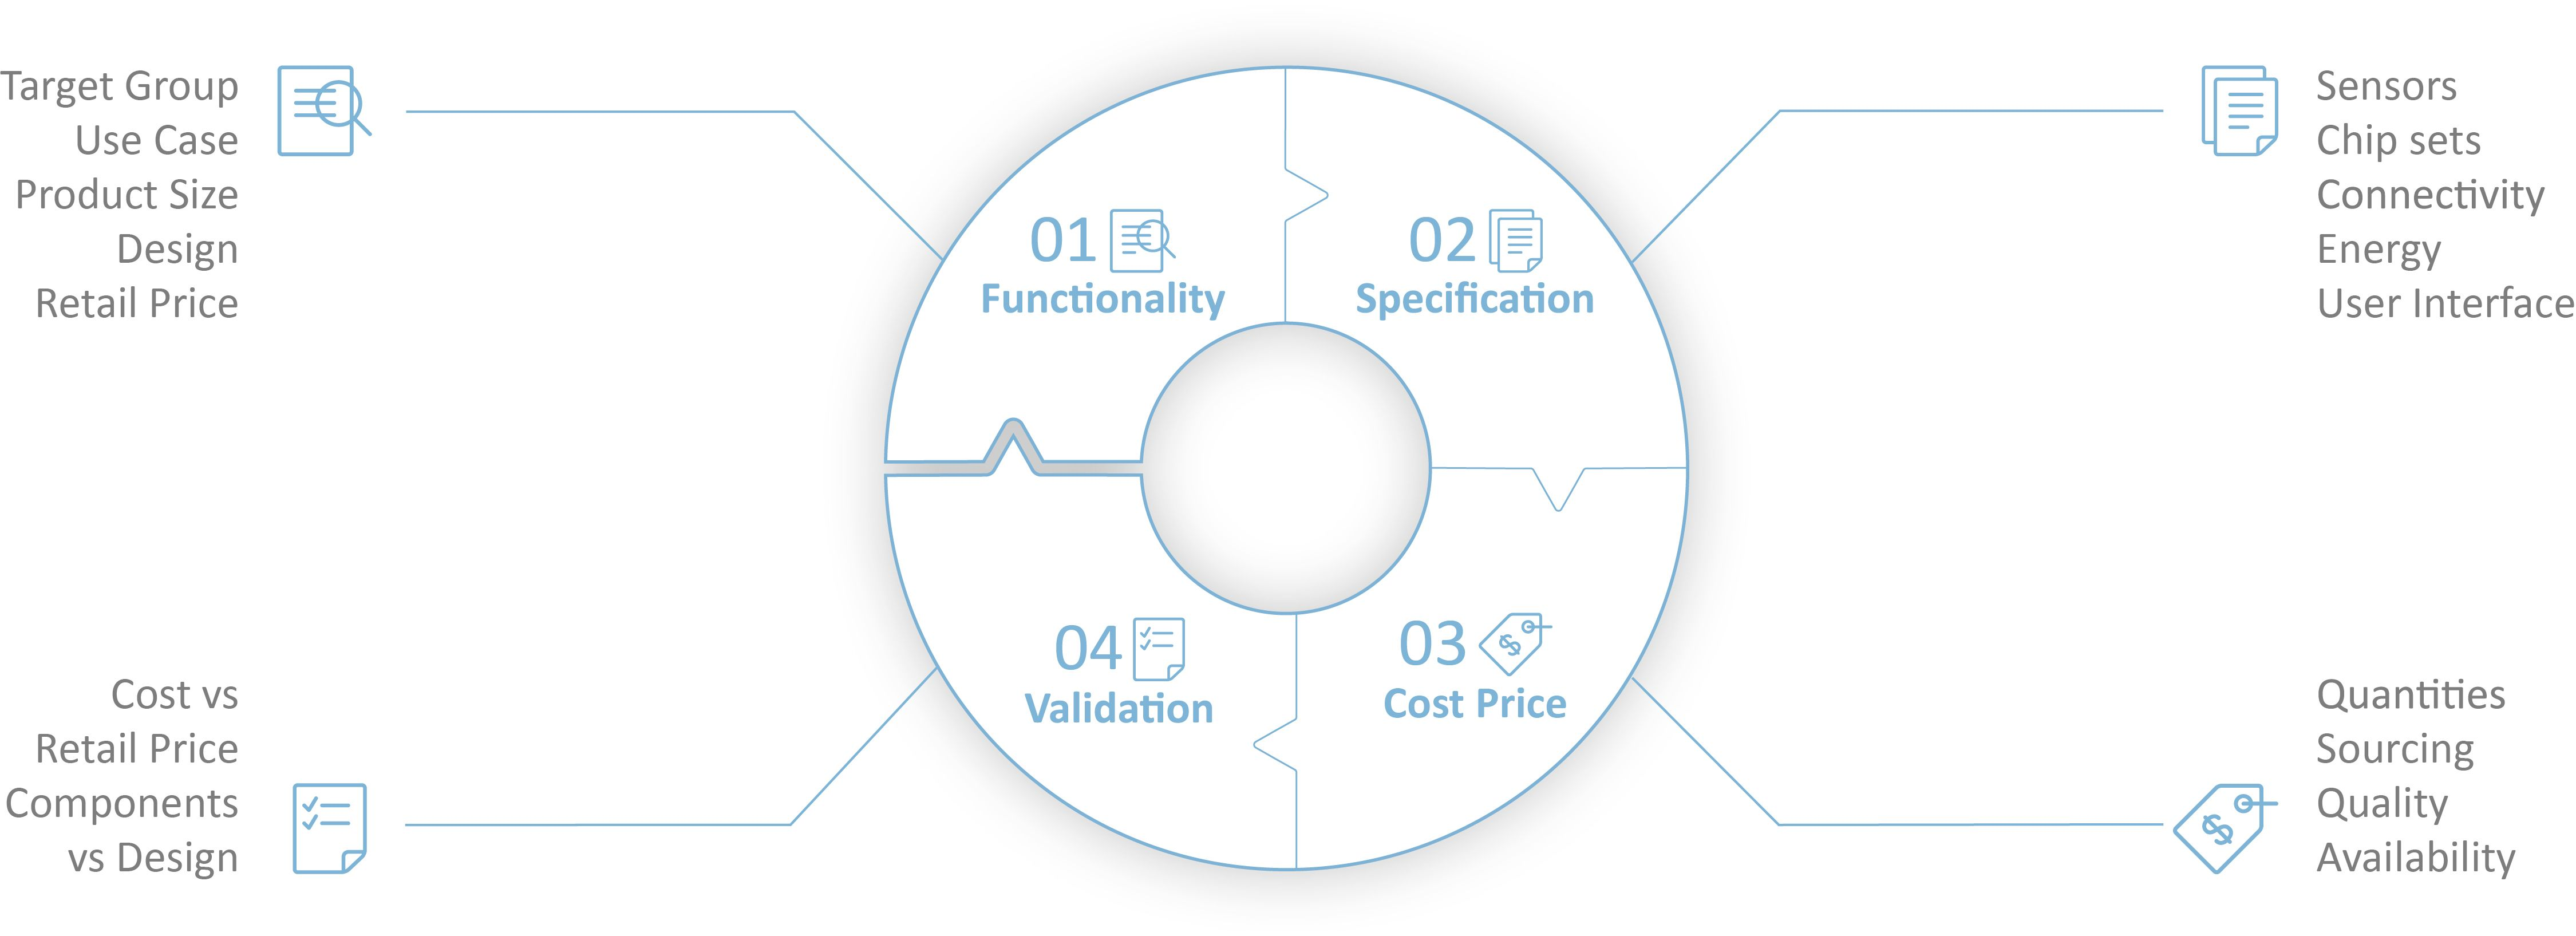 slimdesign Timeline IoT process